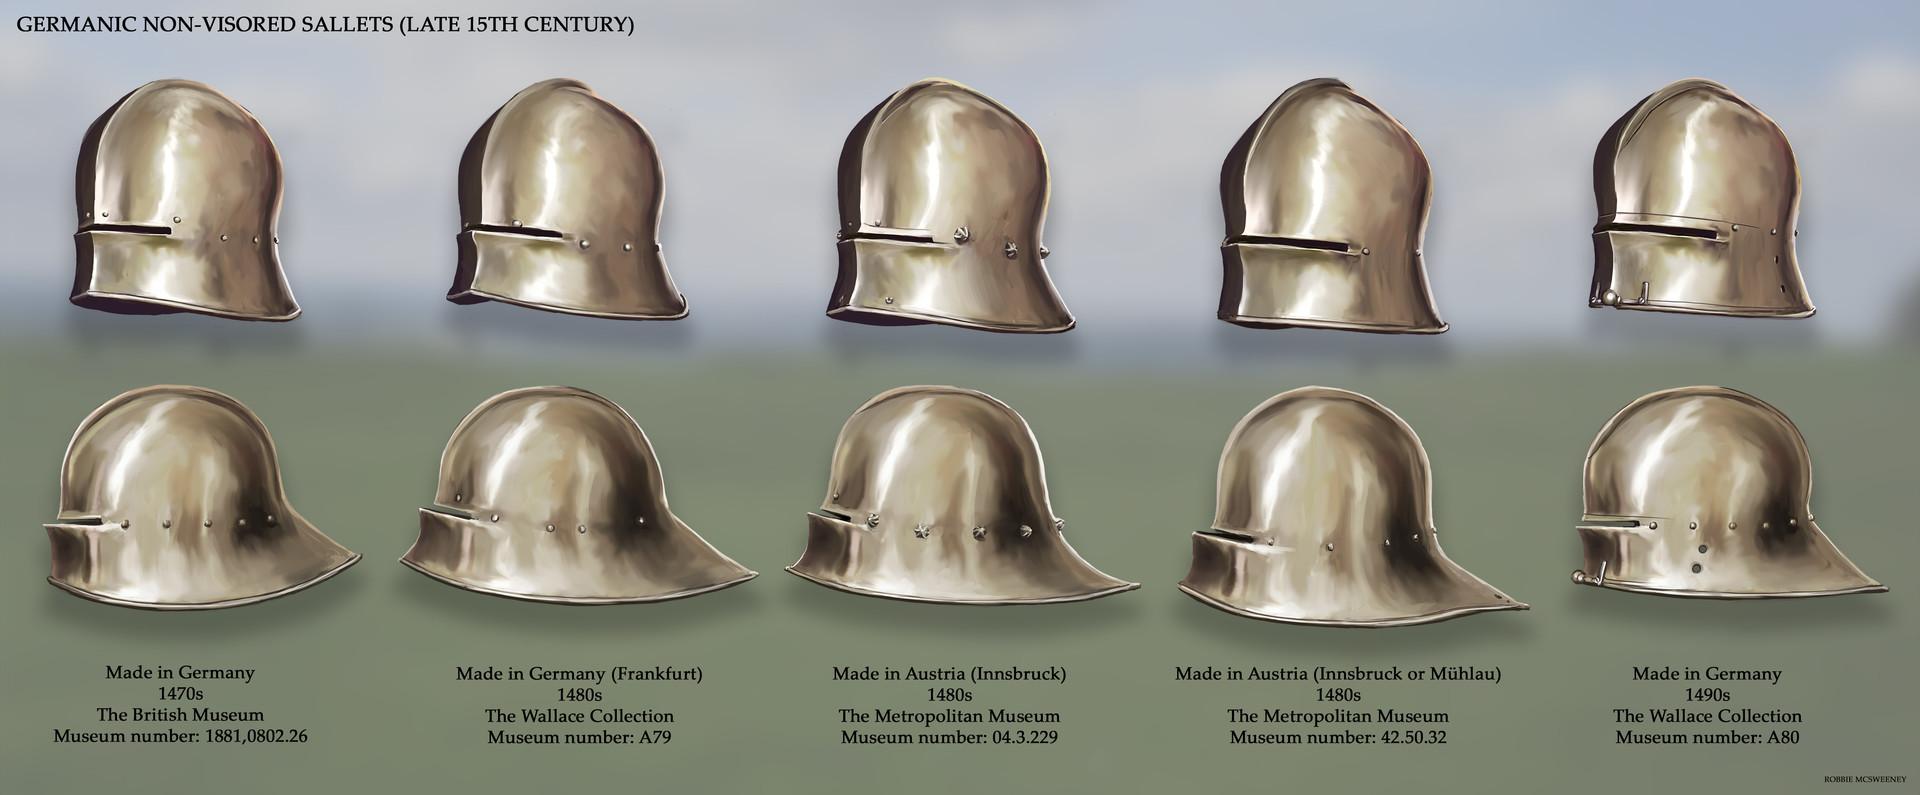 Germanic Non-Visored Sallets